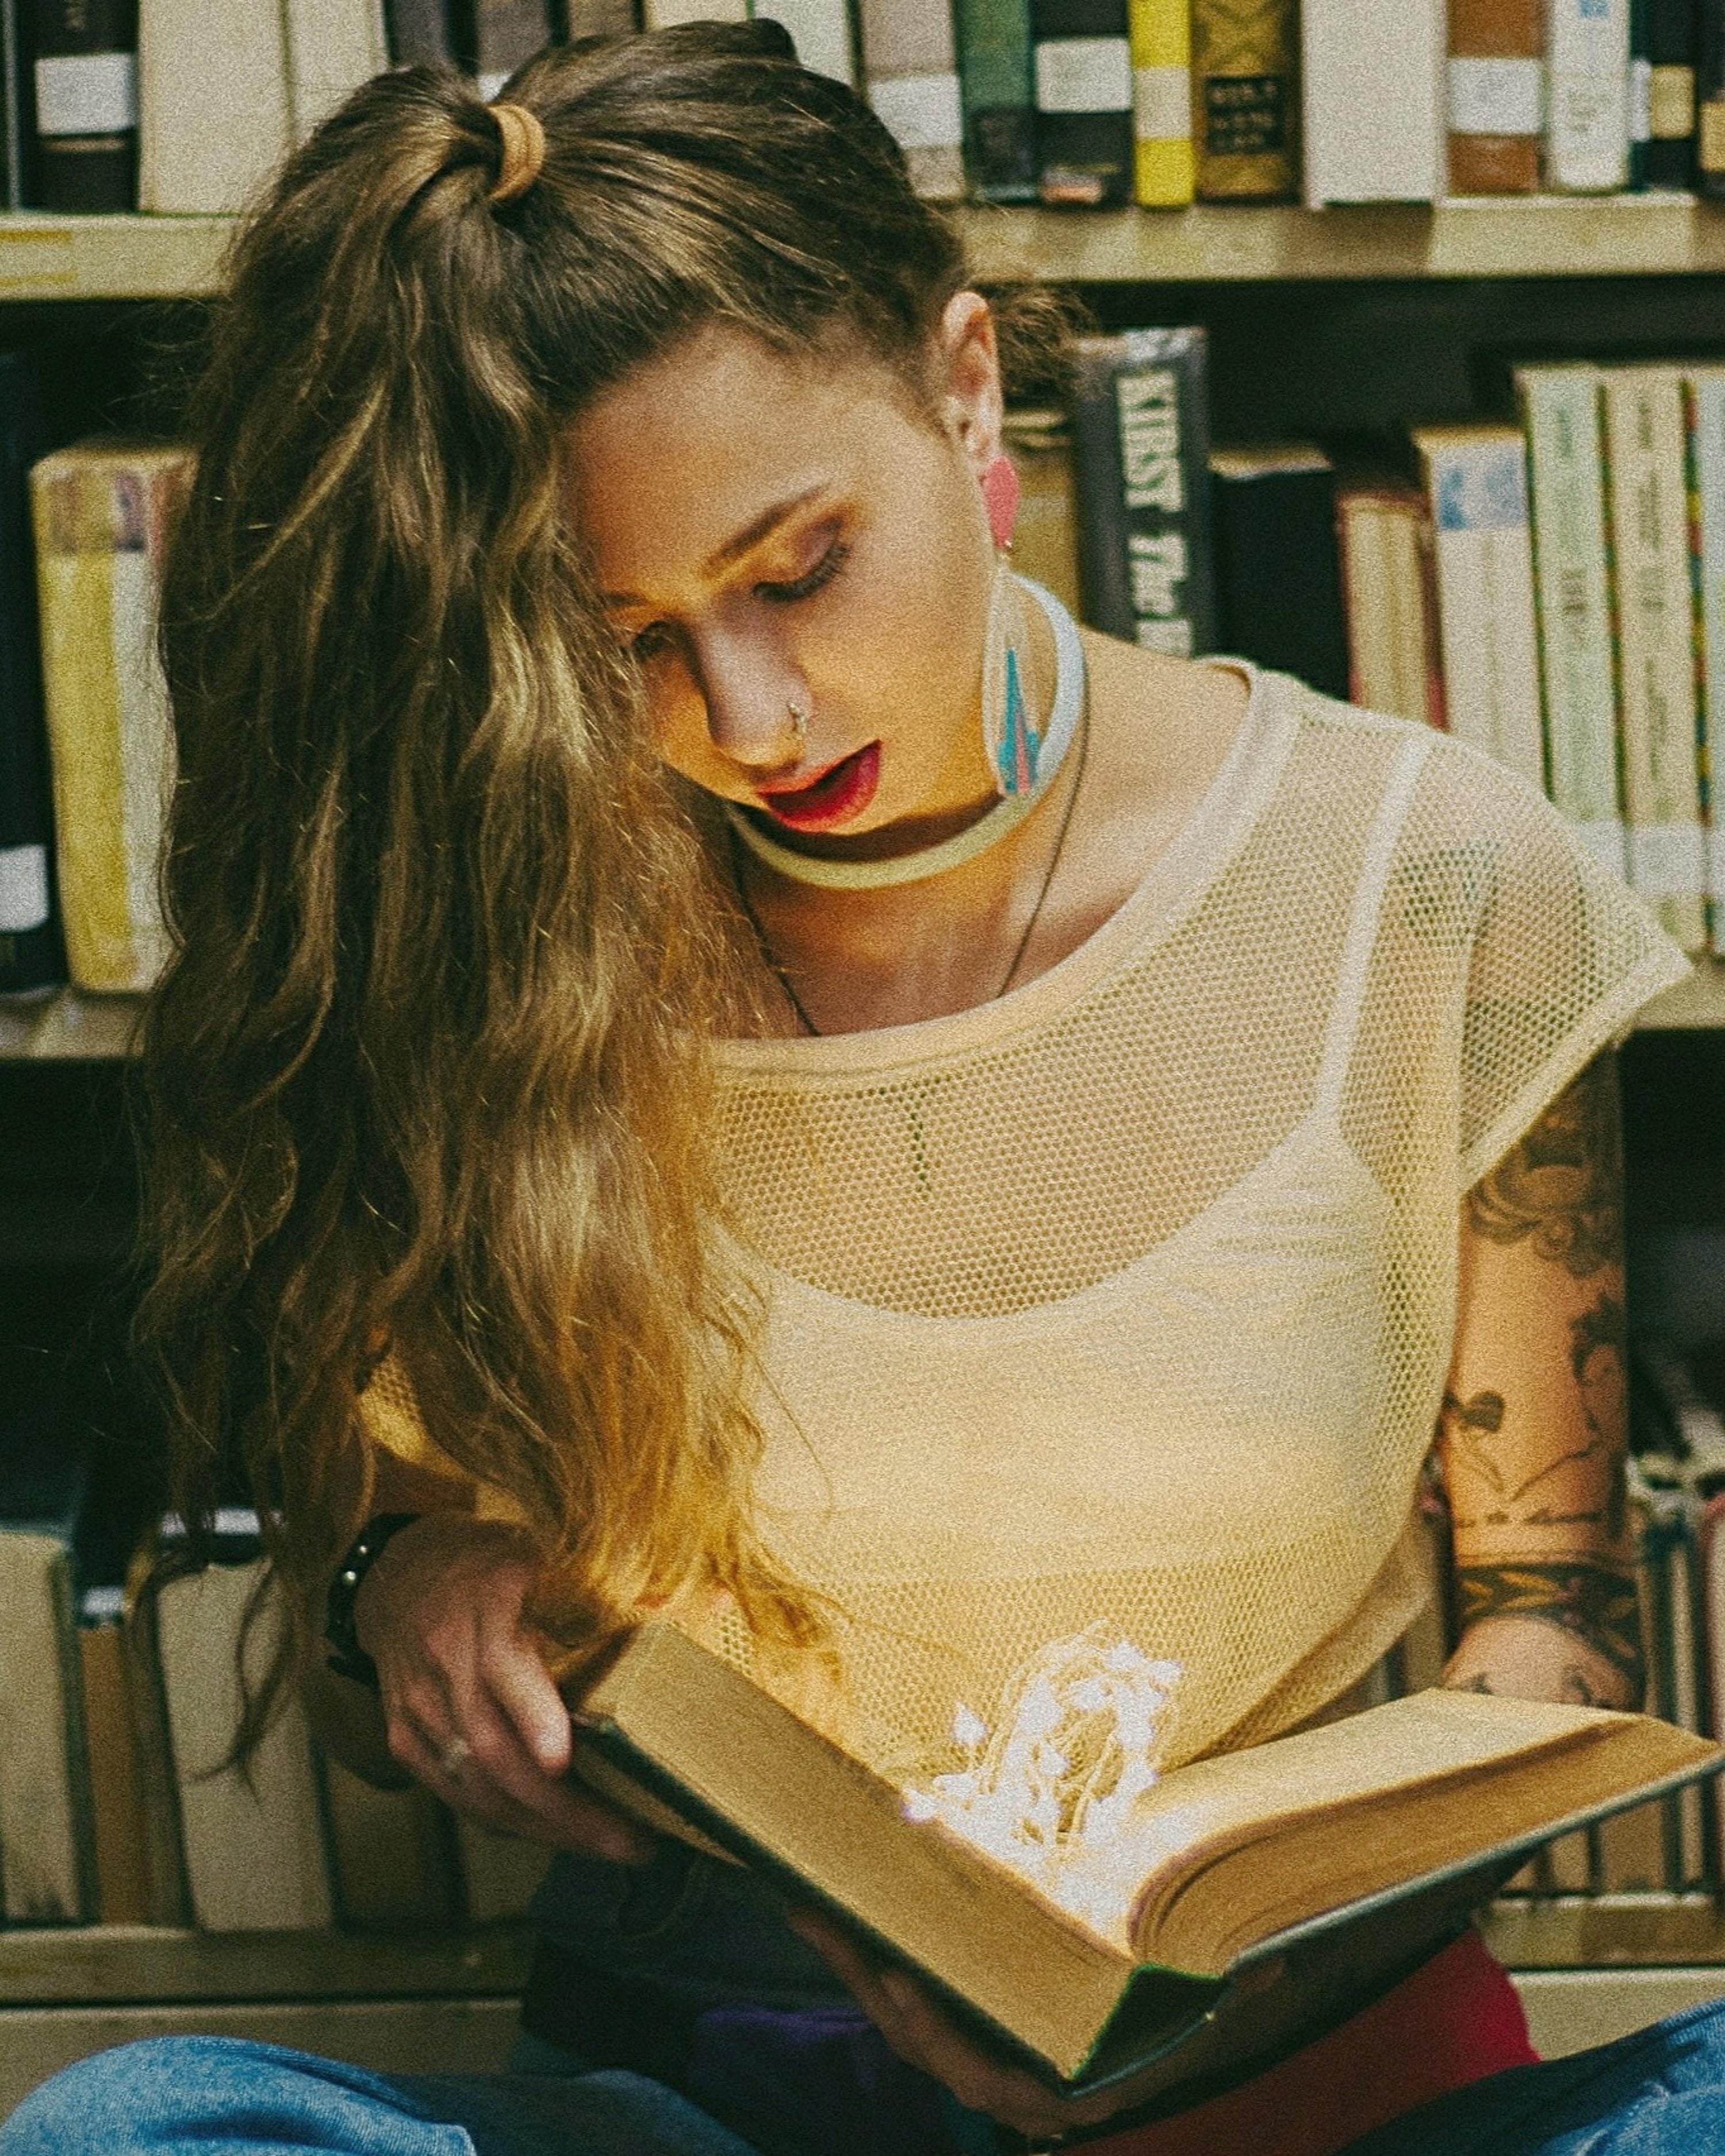 woman wearing white spaghetti strap dress reading book inside library